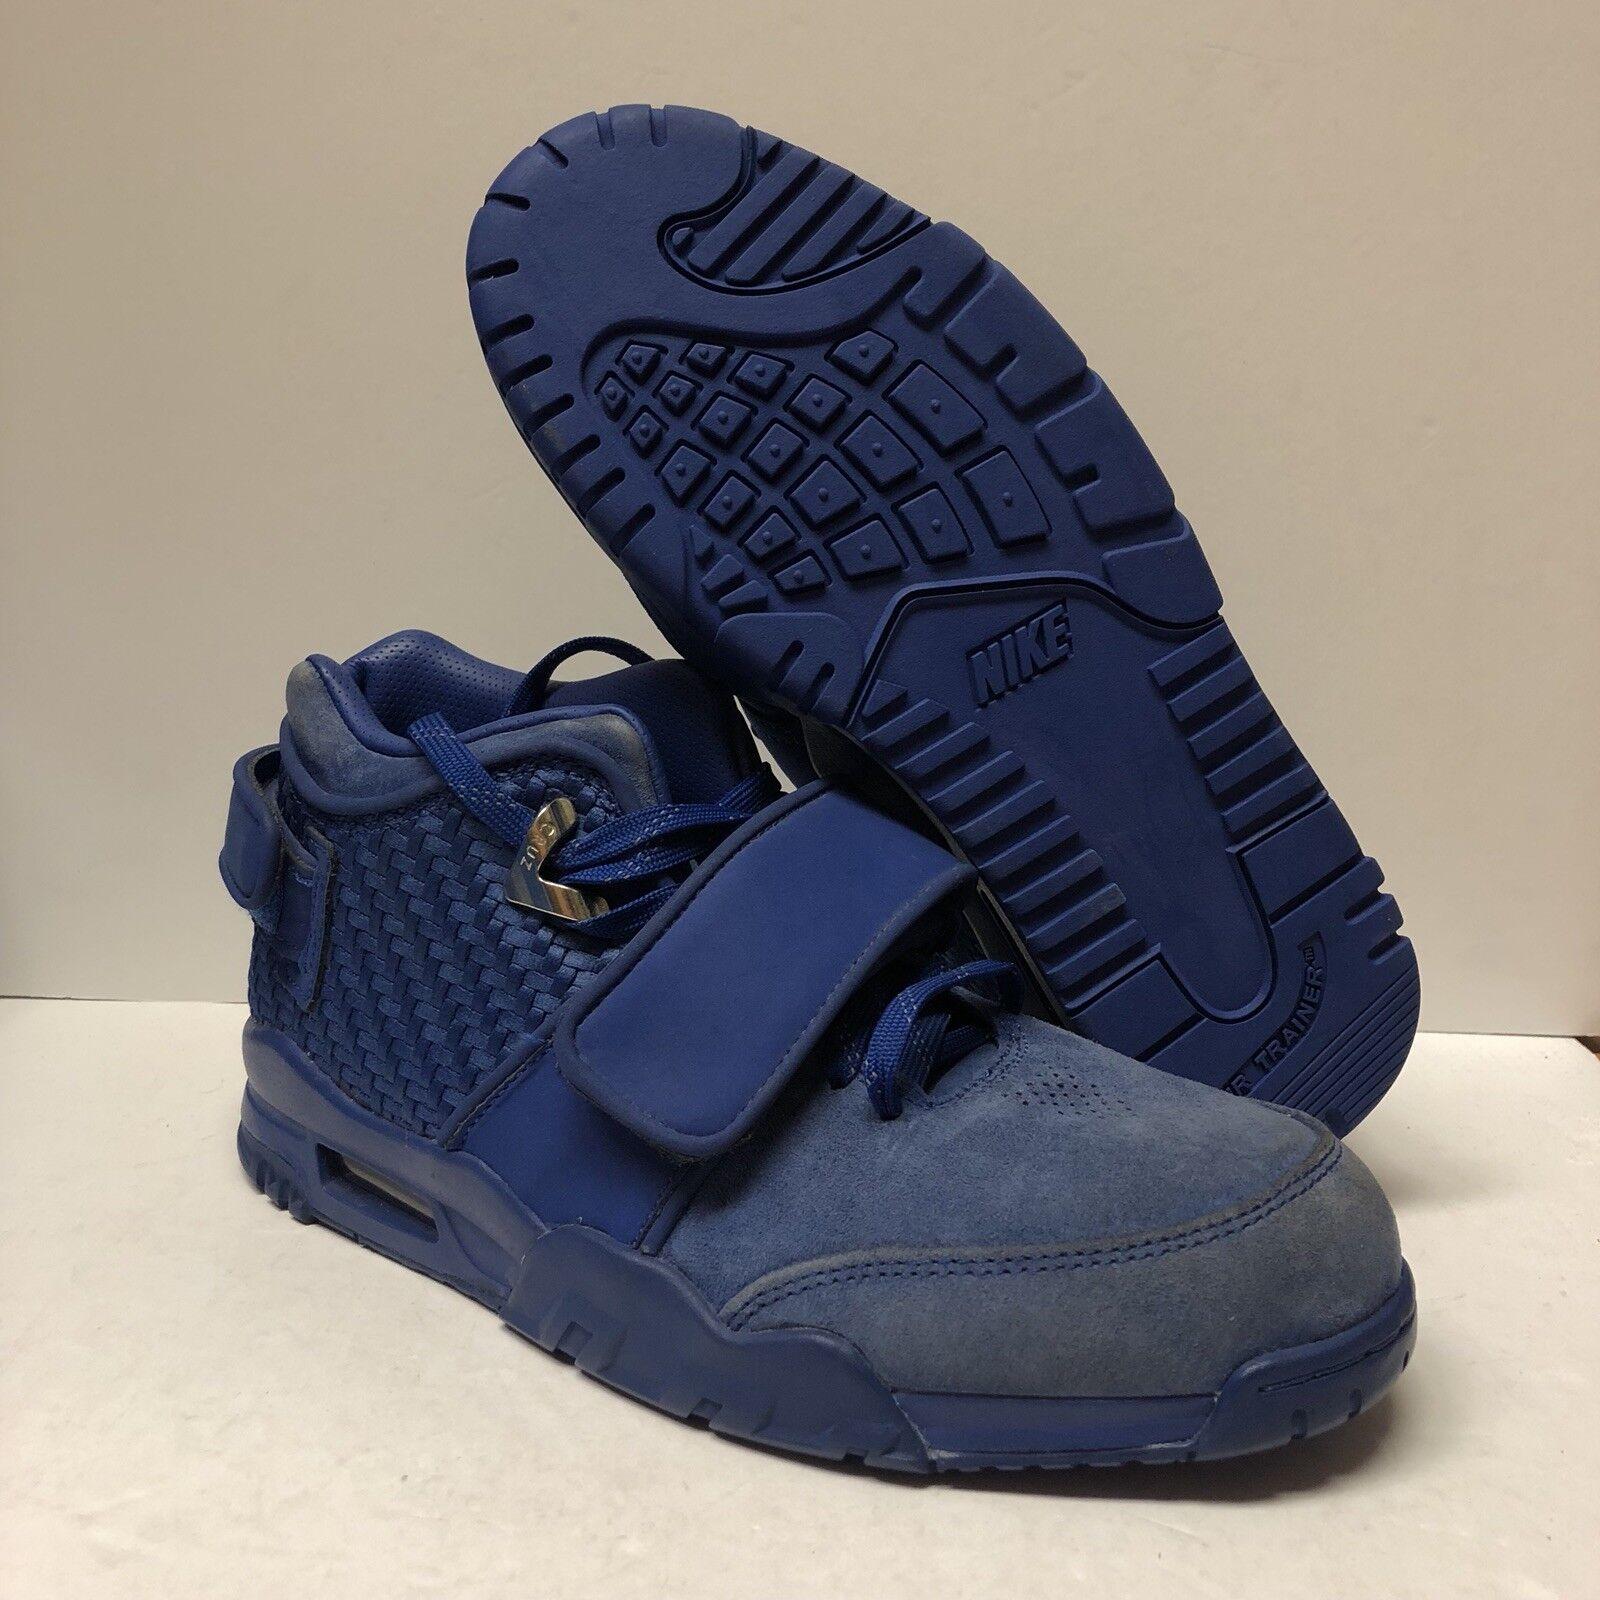 Authentic Nike Air Trainer Victor Cruz Size 8.5 Blue Suede (NO BOX) *Read Desc*